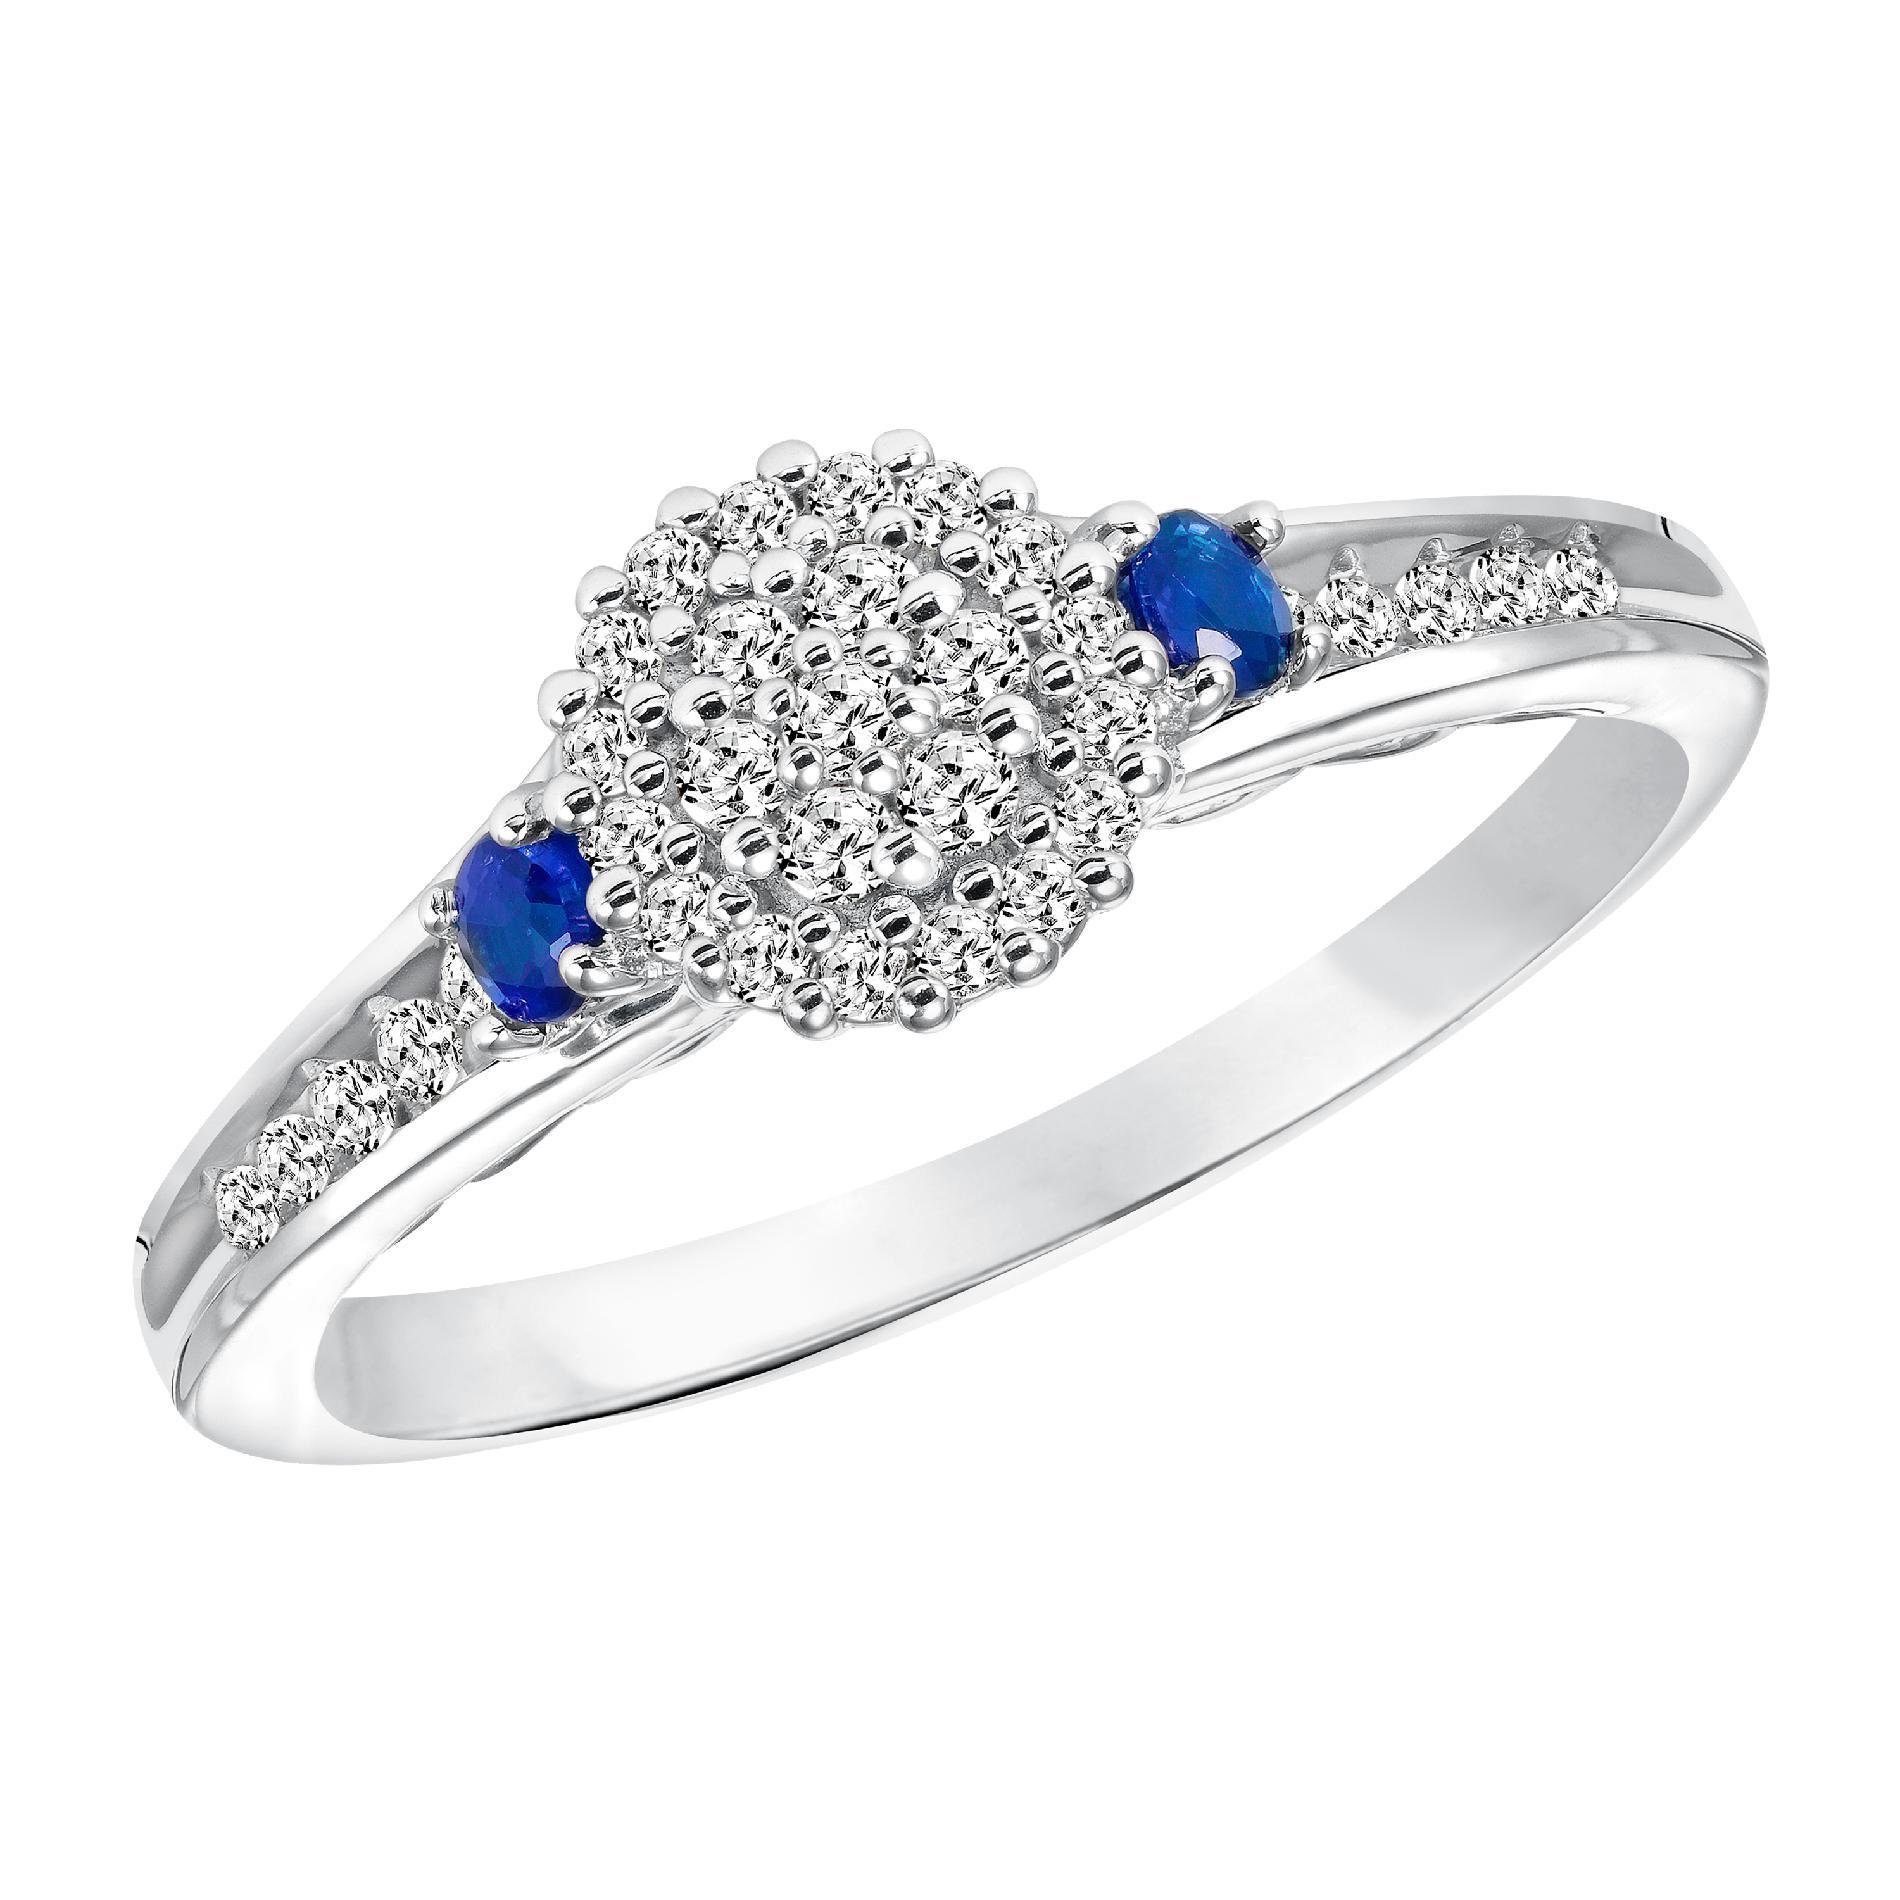 b women wedding rings Sterling Silver